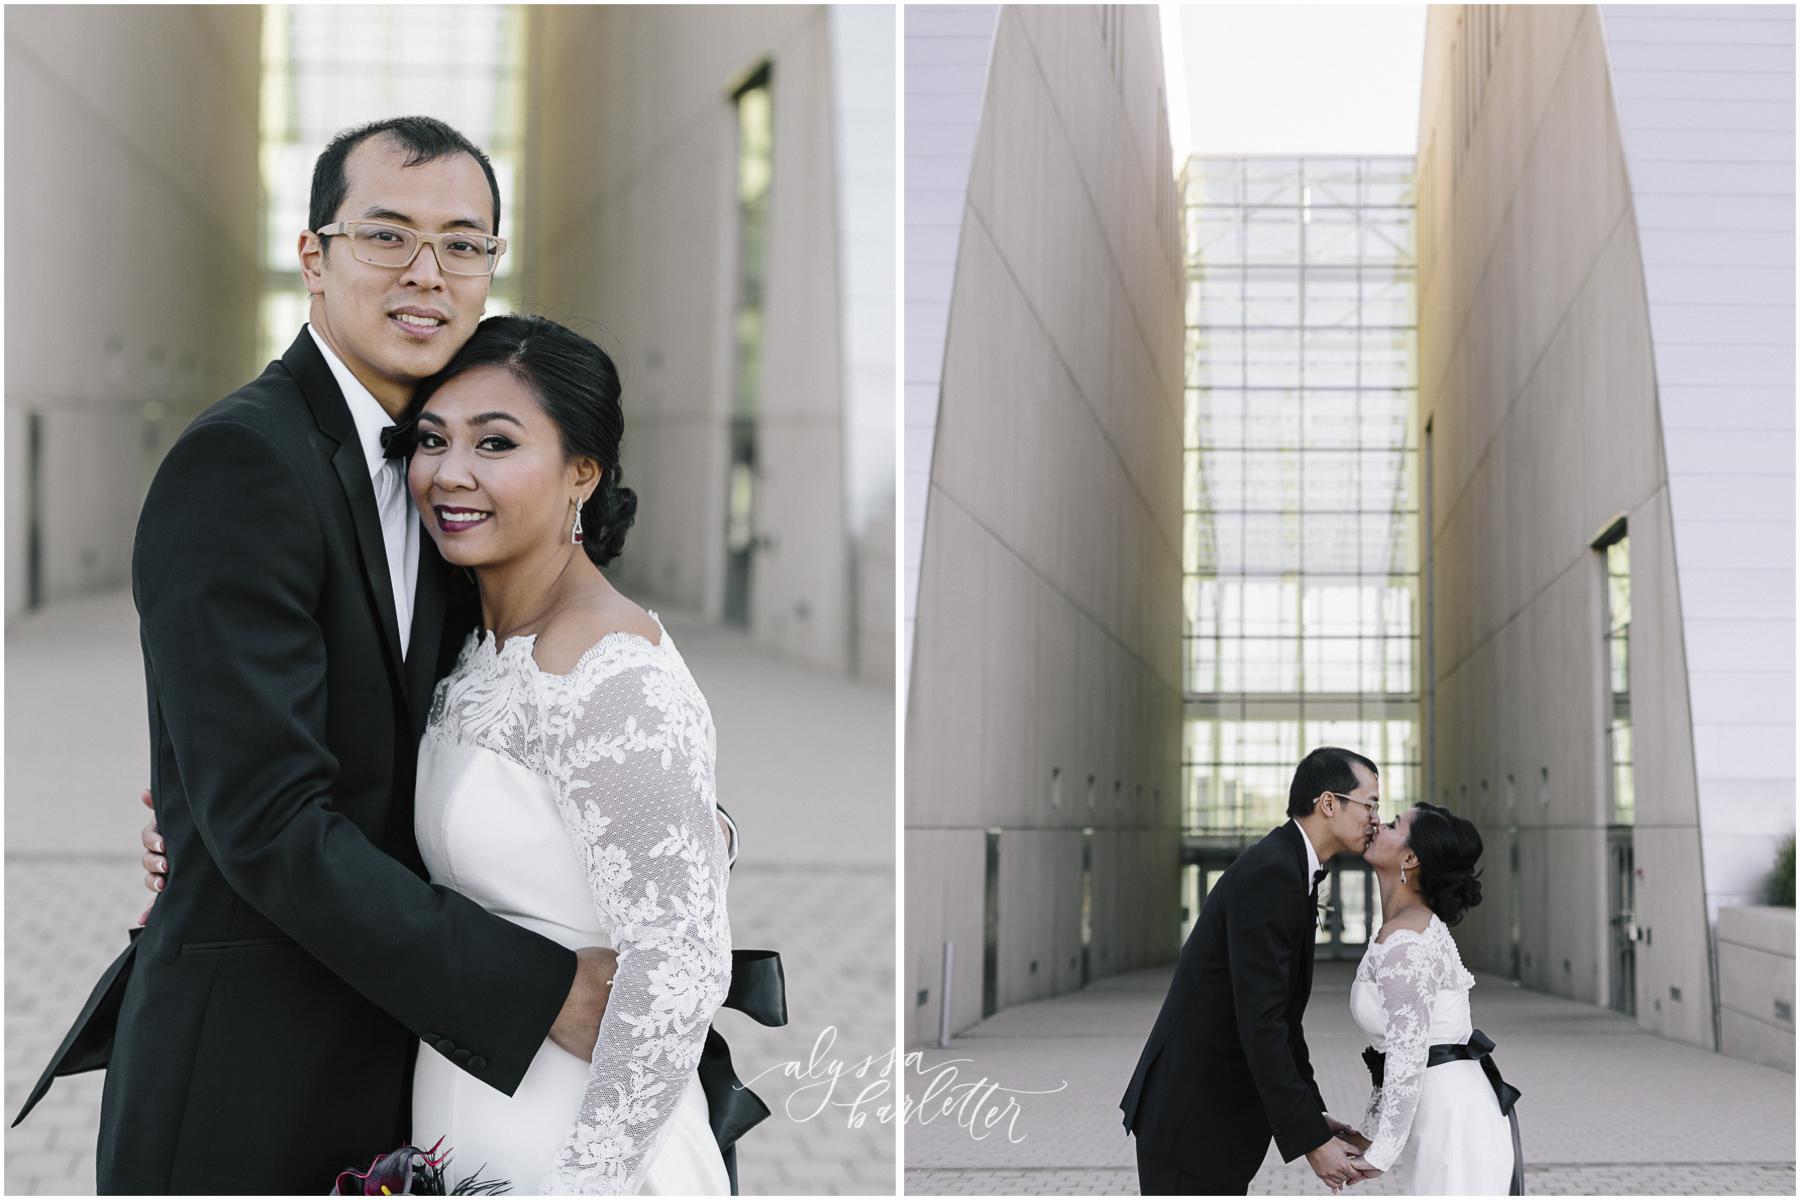 alyssa barletter photography union station wedding photos leopard print winter wedding-1-30.jpg